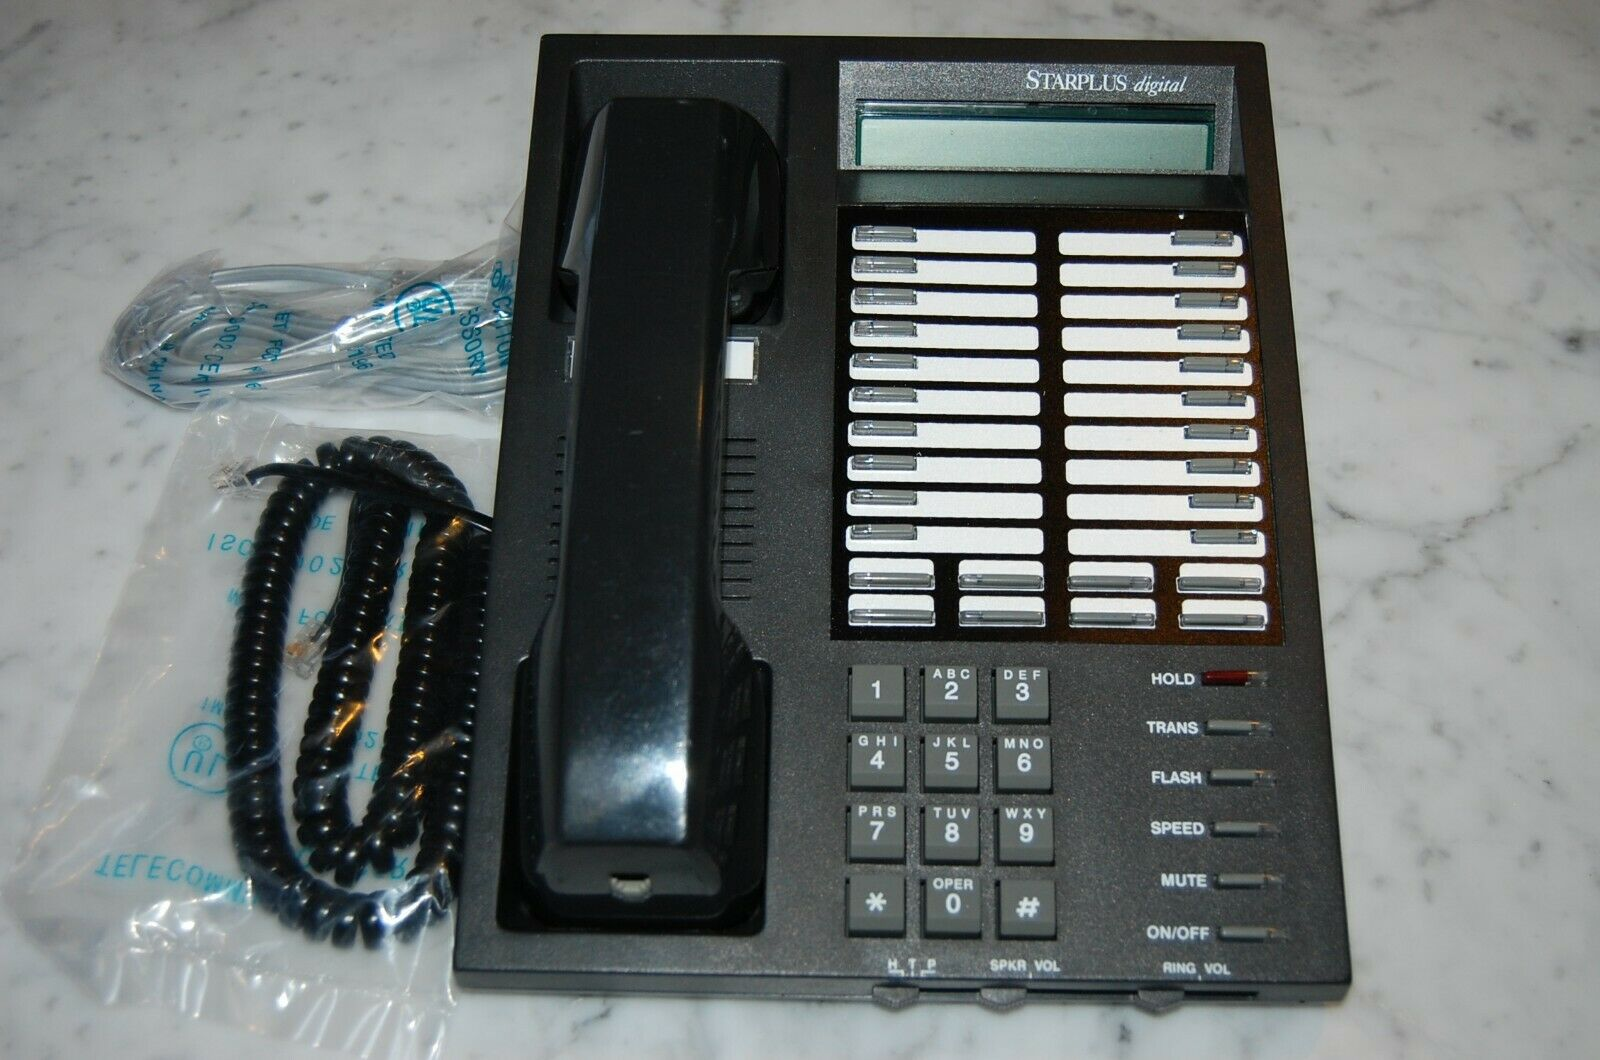 Telecom Systems Vodavi Starplus SP1414-71 Digital Display Phone ...